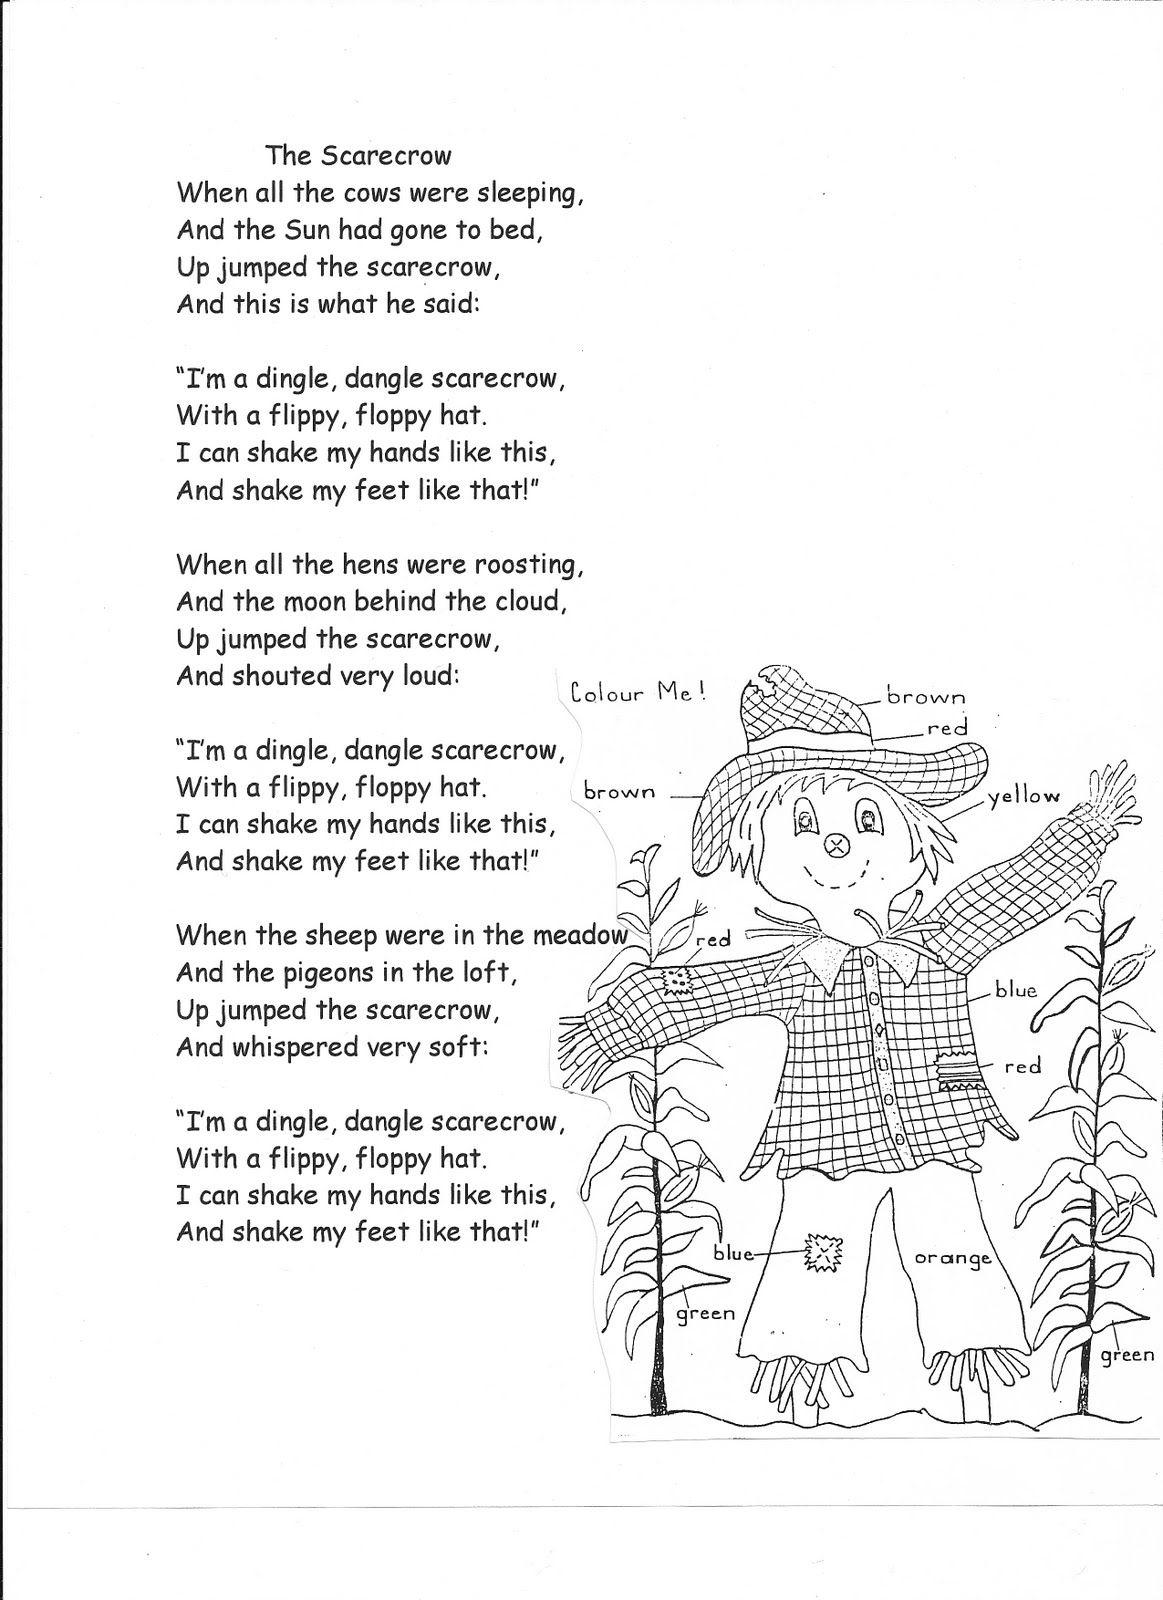 Words Dingle Dangle Scarecrow